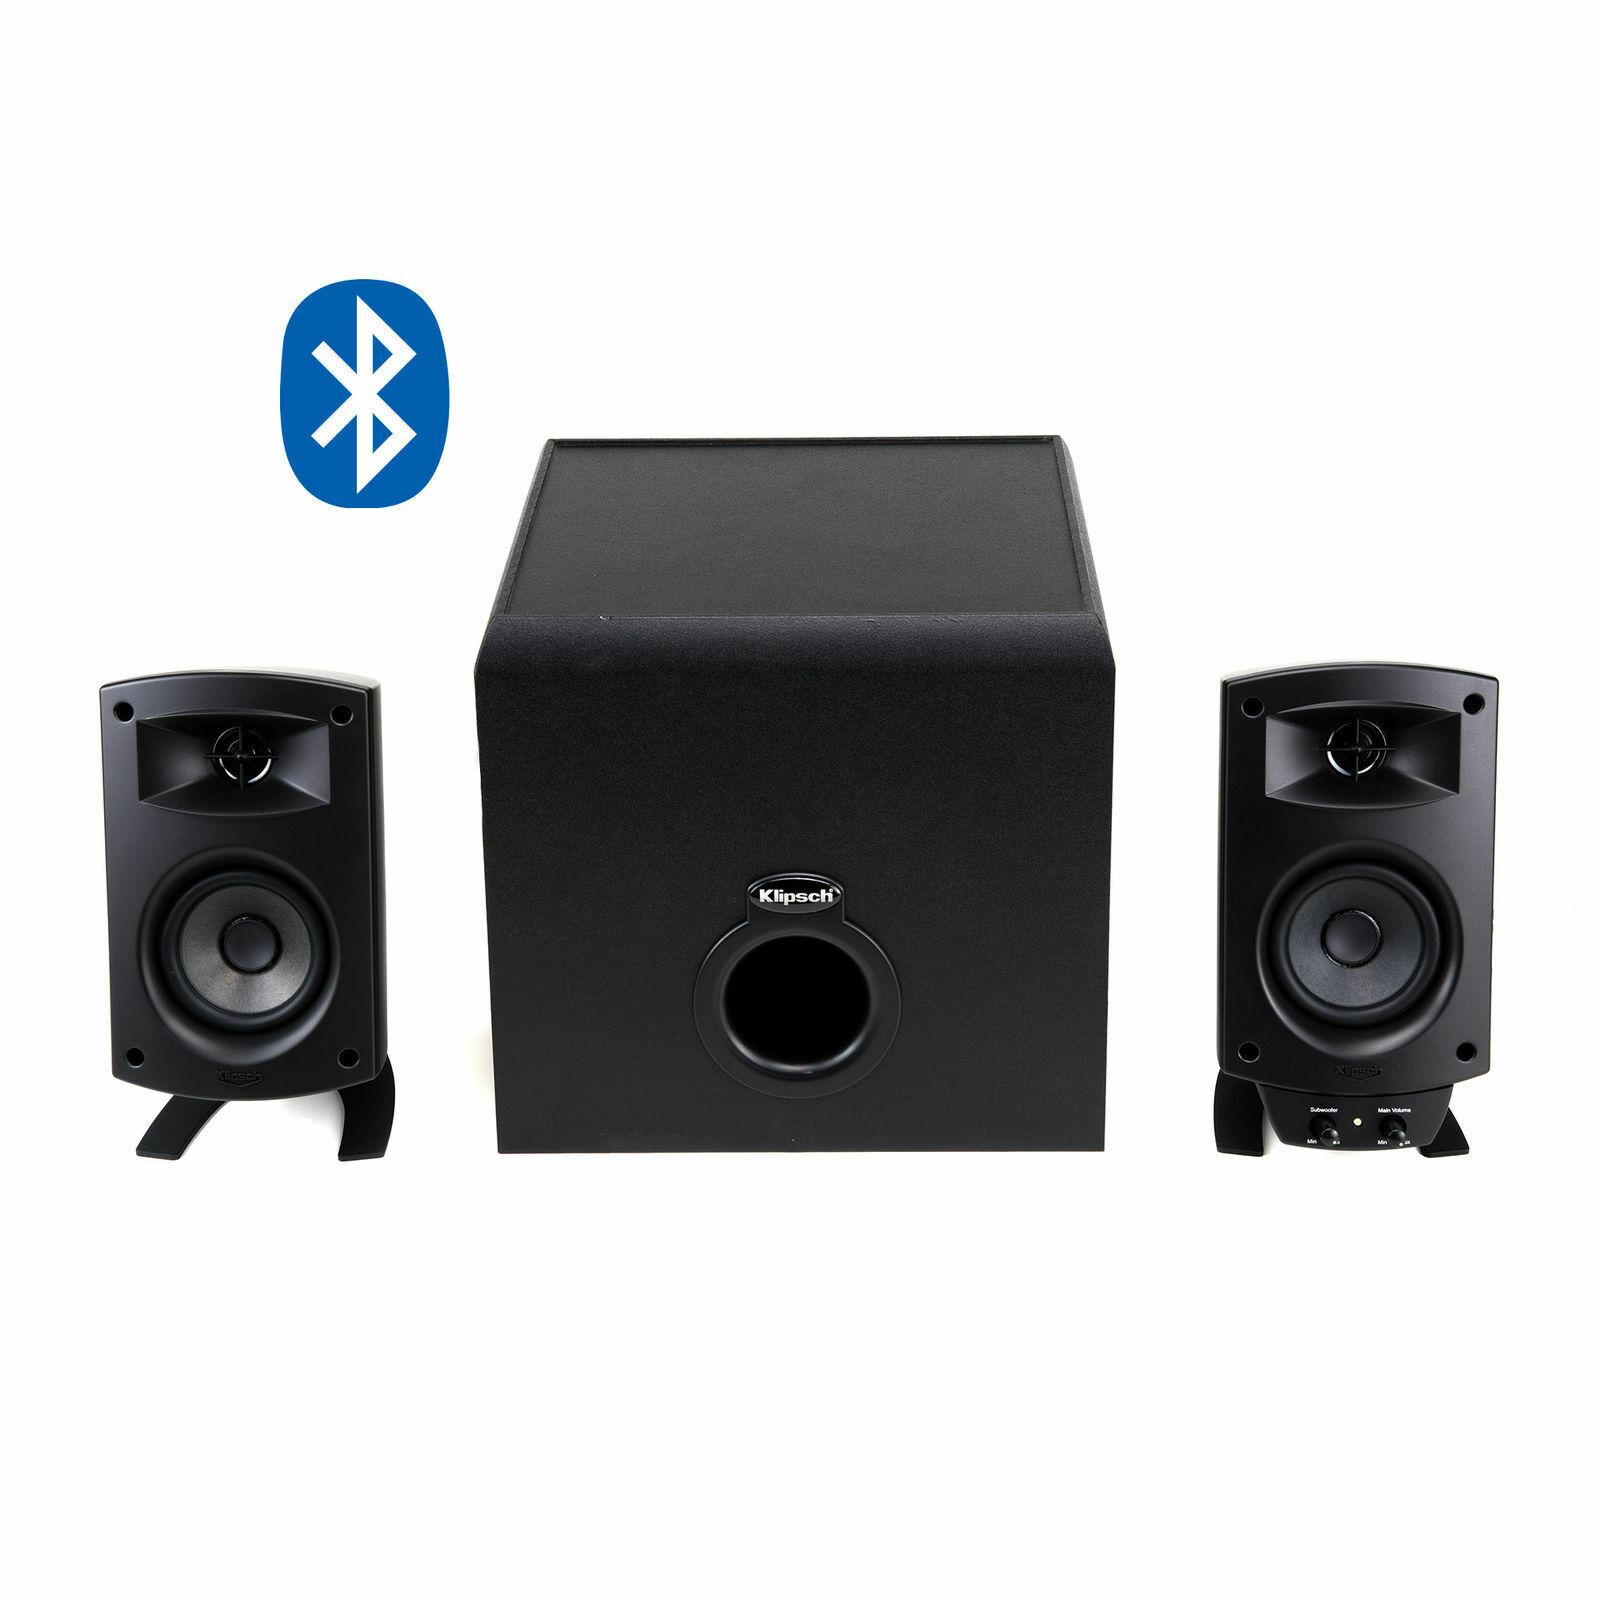 Klipsch - ProMedia 2.1 Bluetooth Speaker System  - Black